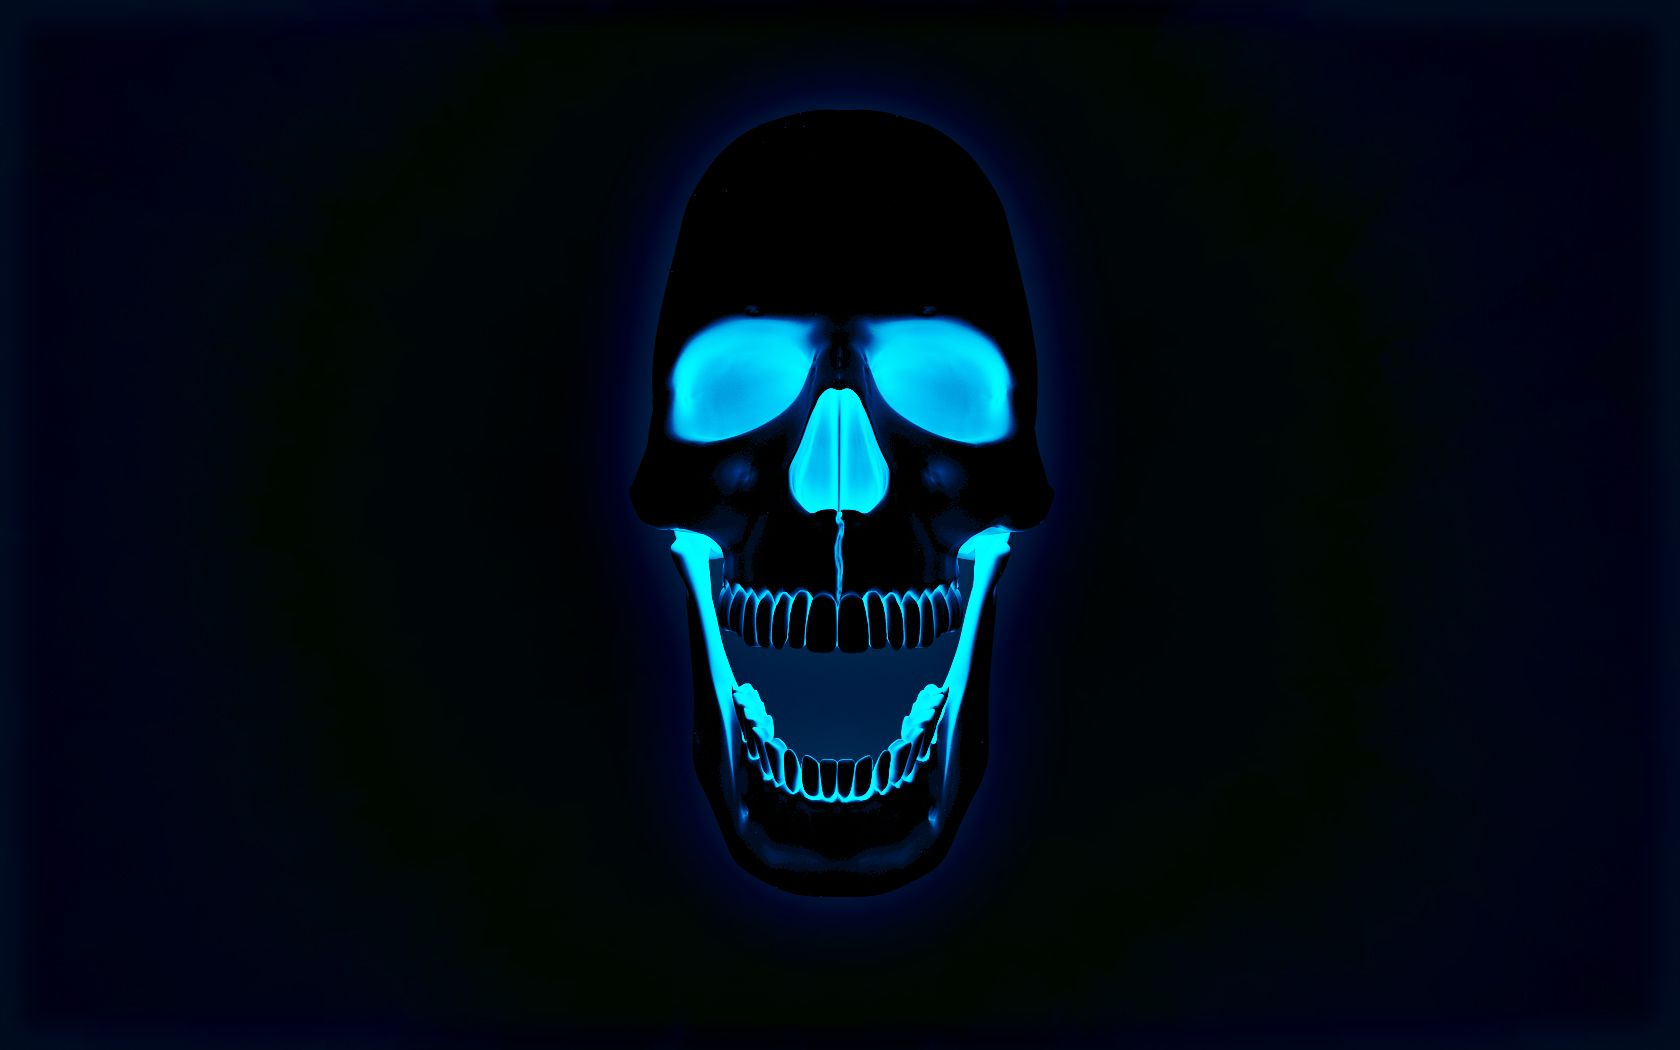 Download Skull Wallpaper Hd Resolution Is Cool Wallpapers At Sxga 16 10 720p Standard Smartwatch Hd O Skull Wallpaper Sugar Skull Wallpaper Hd Skull Wallpapers